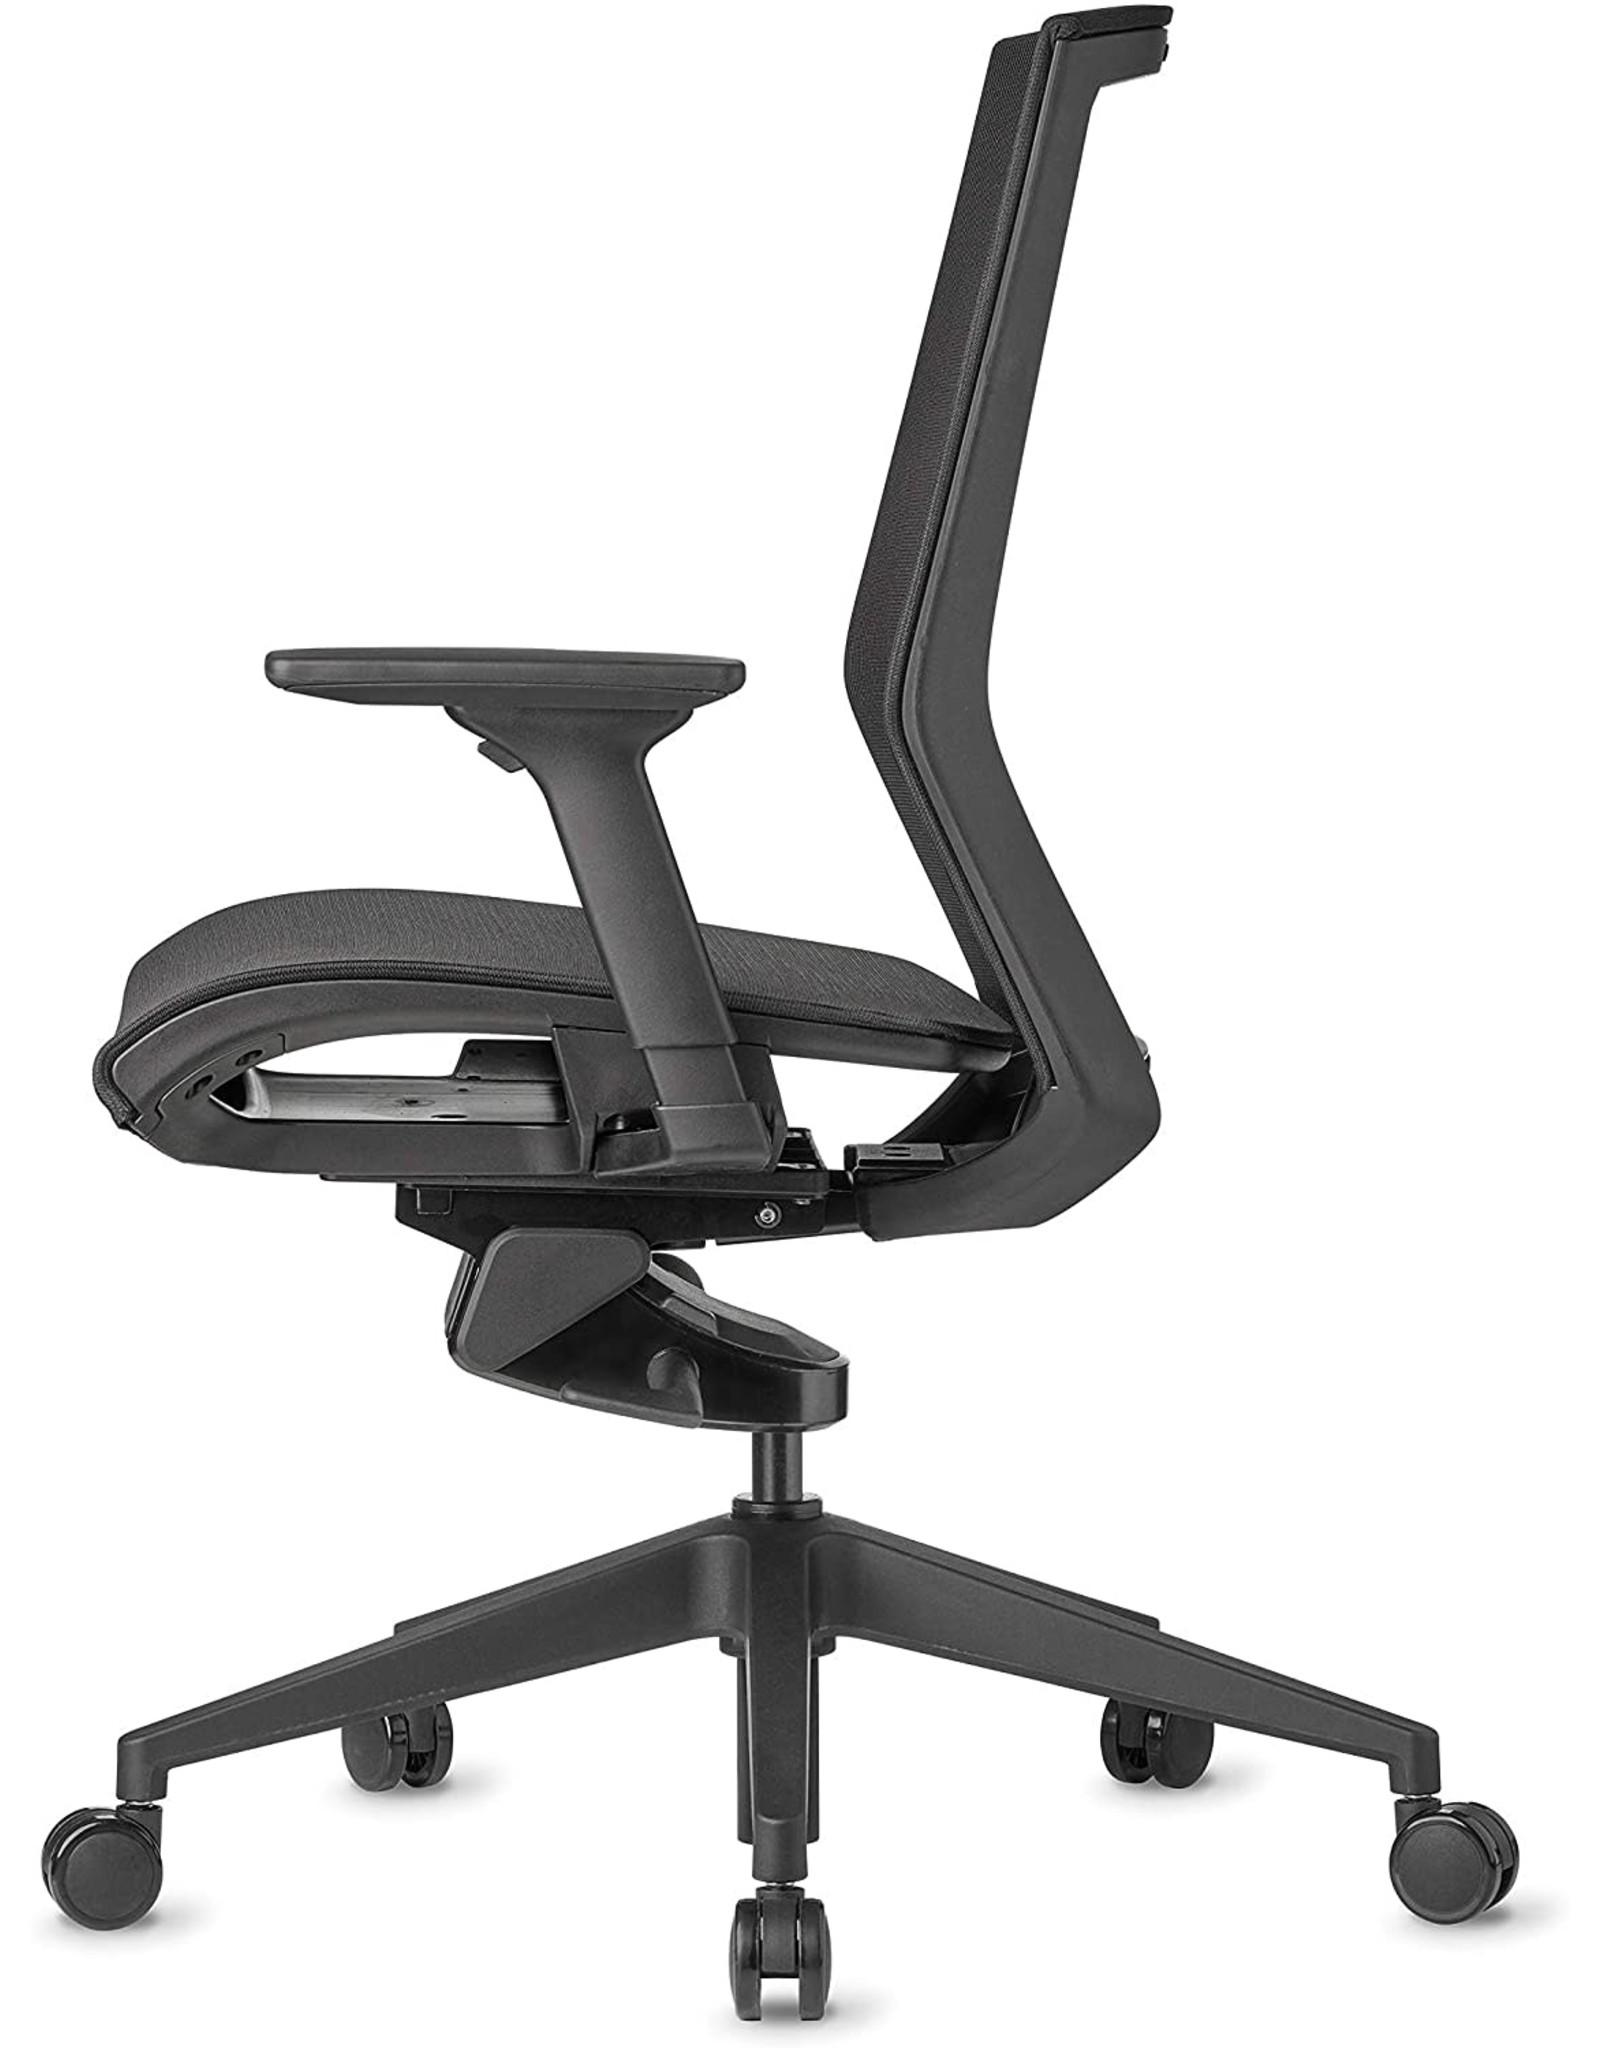 AMQ AMQ ZILO Ergonomic Office Chair, Black/Mesh Seat